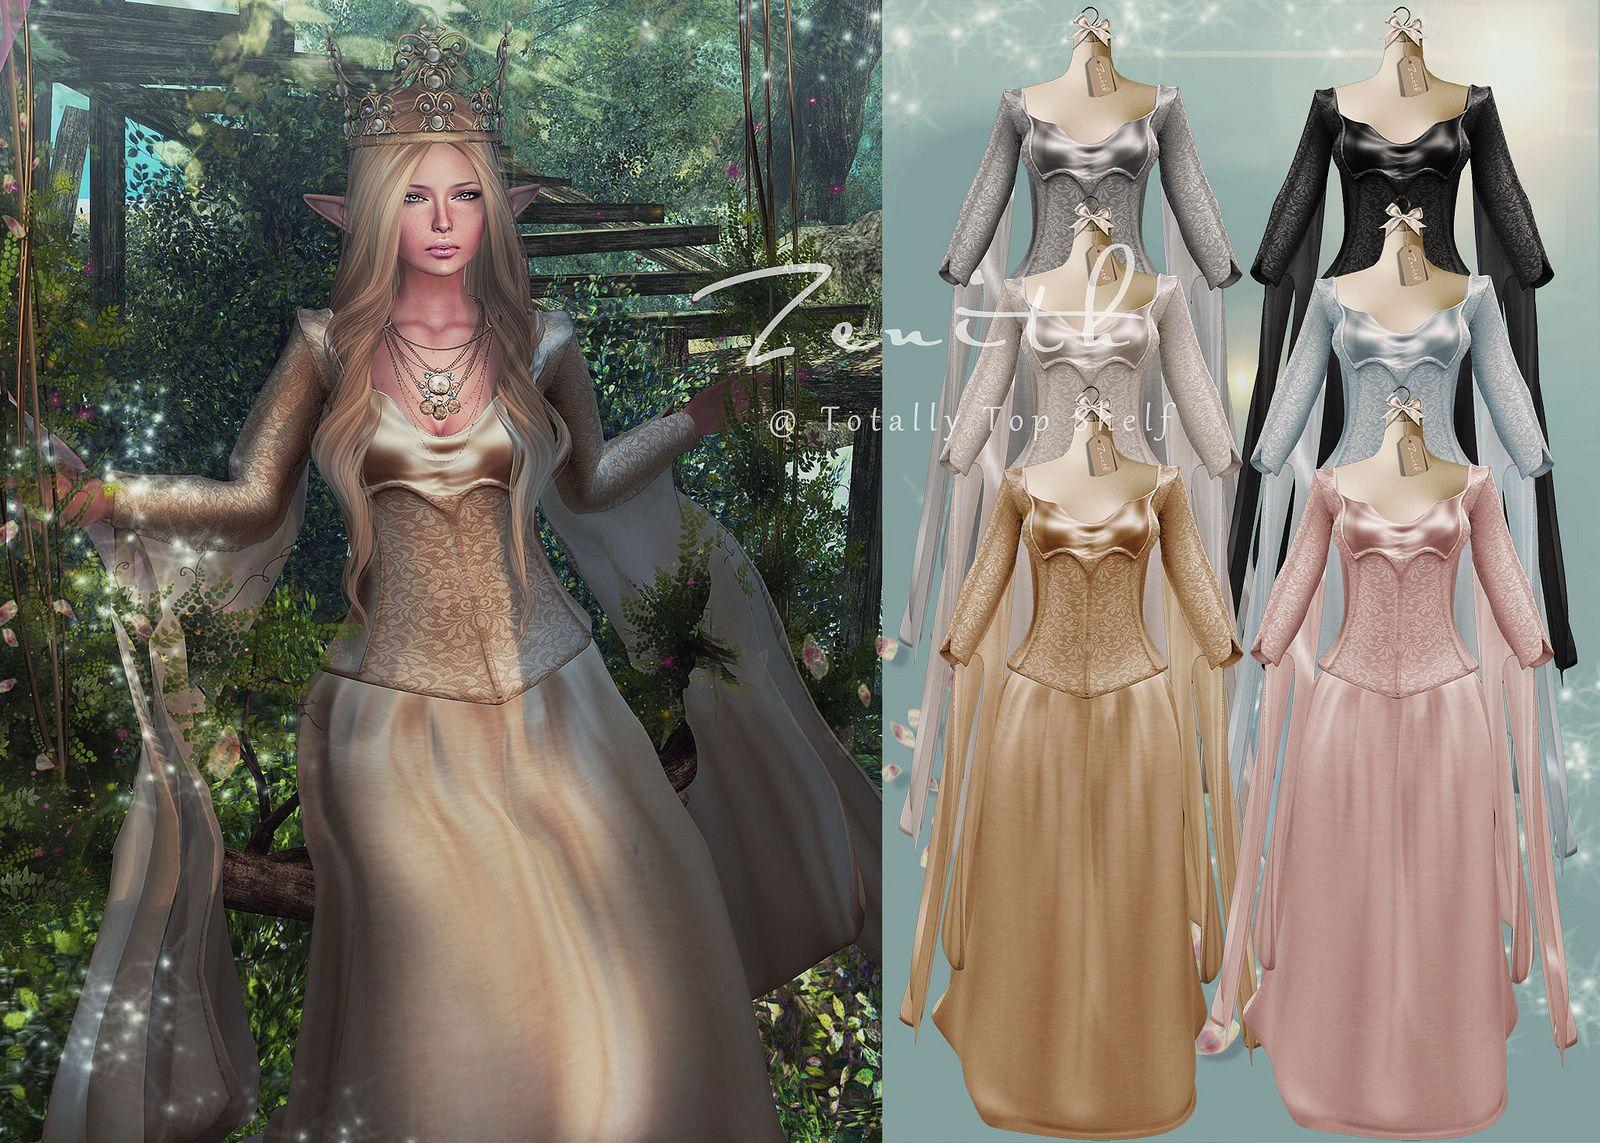 High Elf Princess dress @ TTS | Flickr - Photo Sharing!